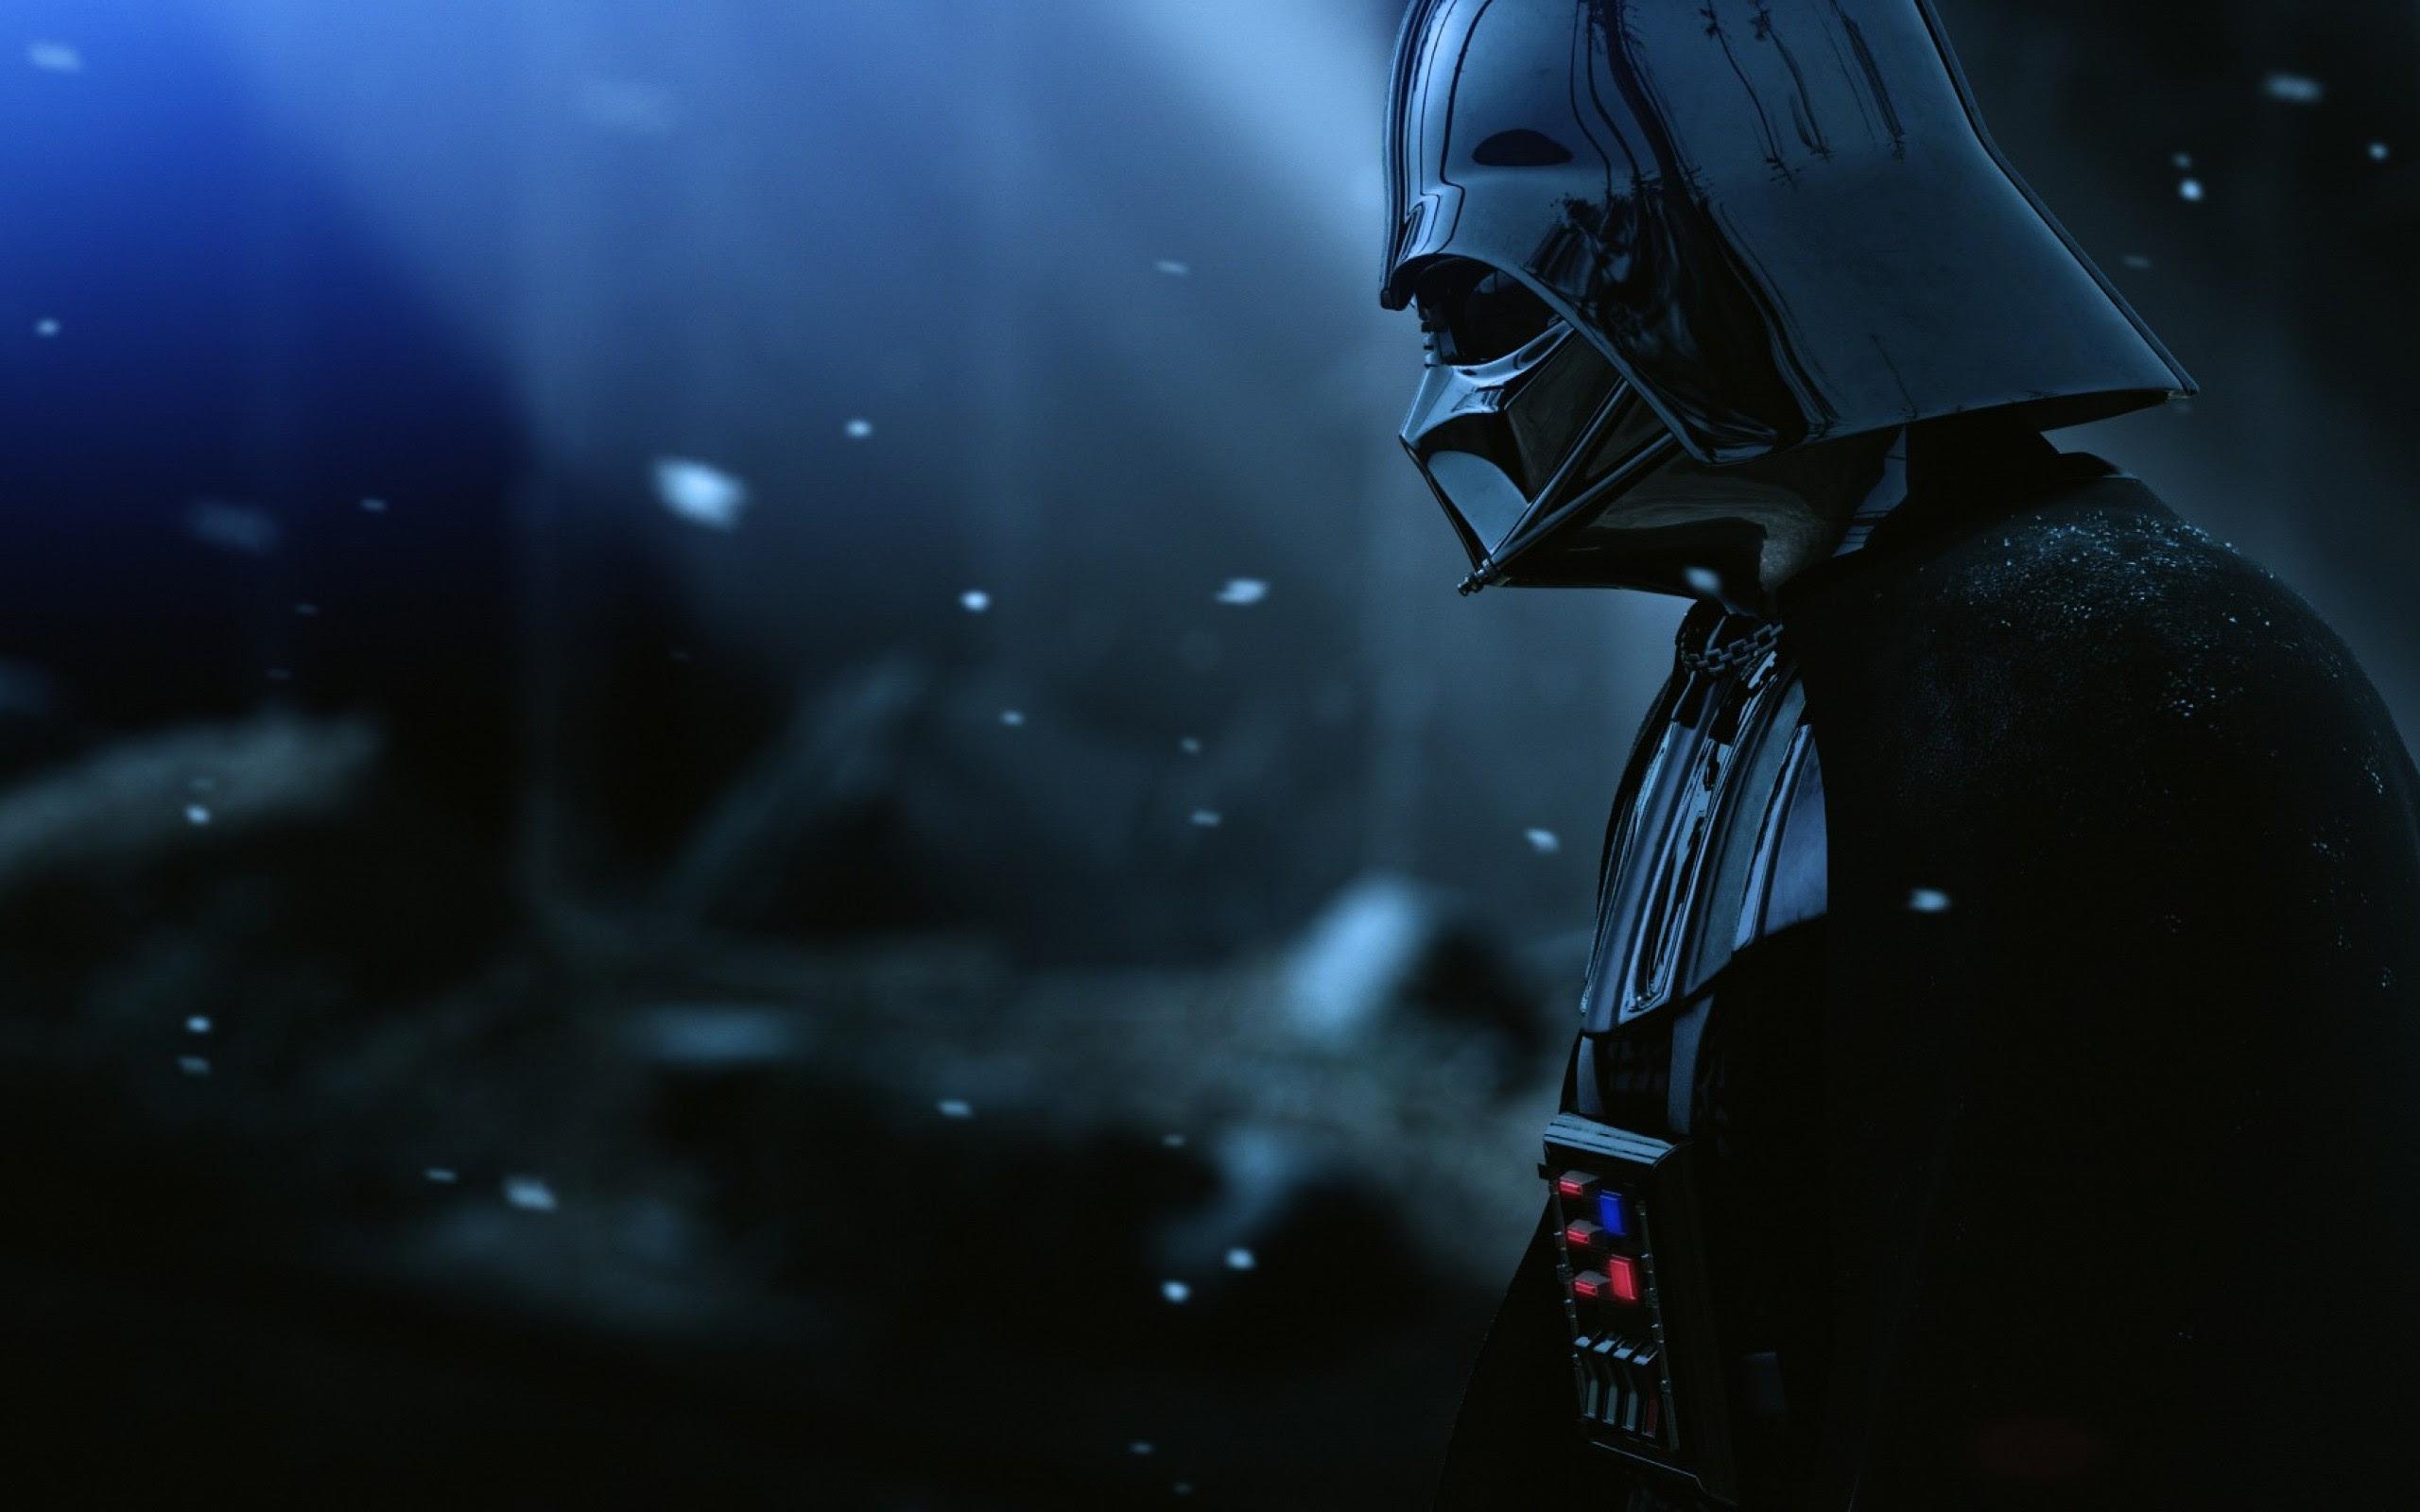 Star Wars Darth Vader Hd Wallpaper For Desktop And Mobiles 13 Retina Macbook Pro Hd Wallpaper Wallpapers Net